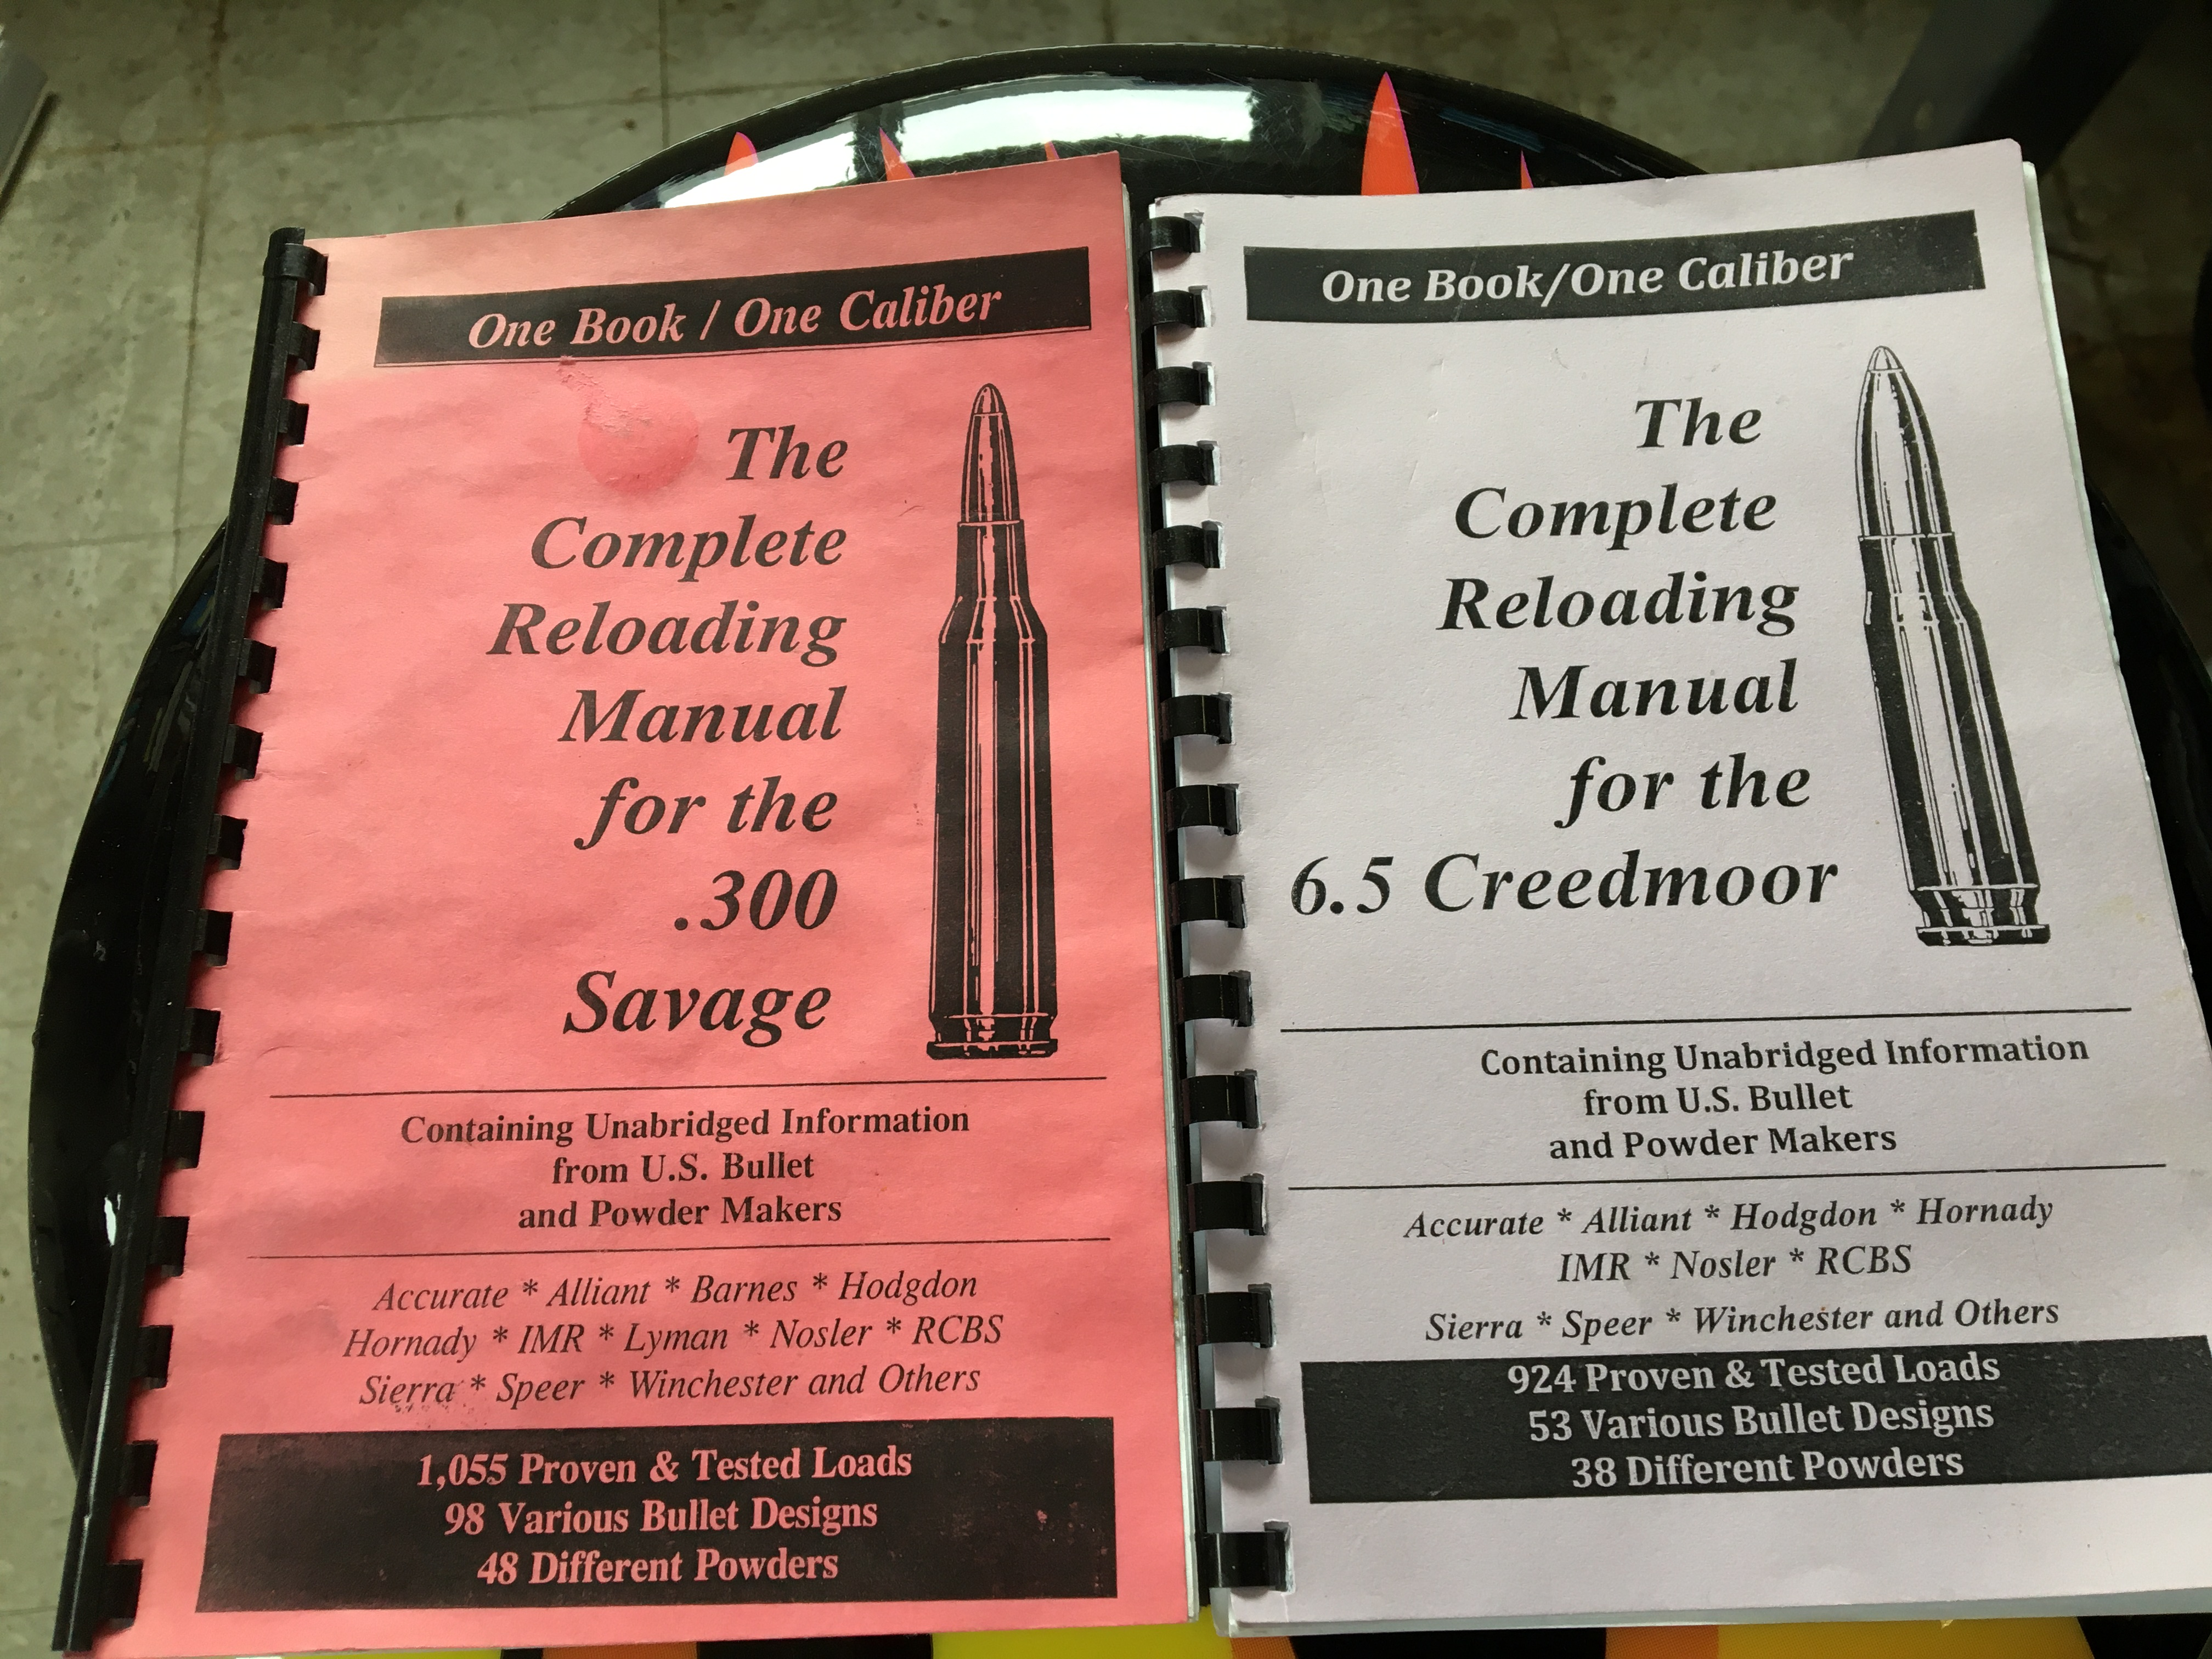 Loadbook Usa 300 Sav and 6.5 Creedmoore.jpg